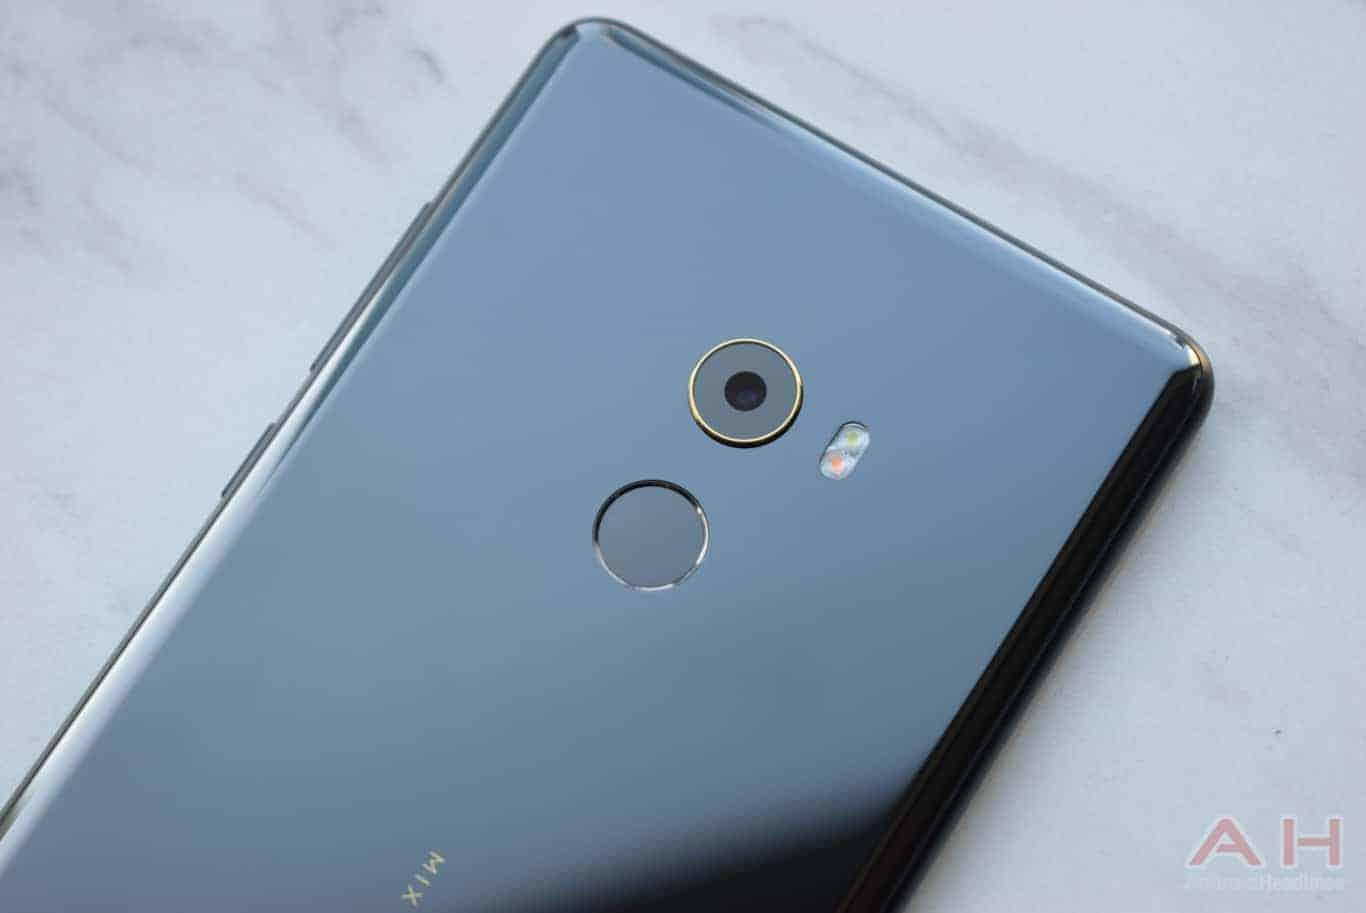 Xiaomi Mi MIX 2 Hands On AM AH 22